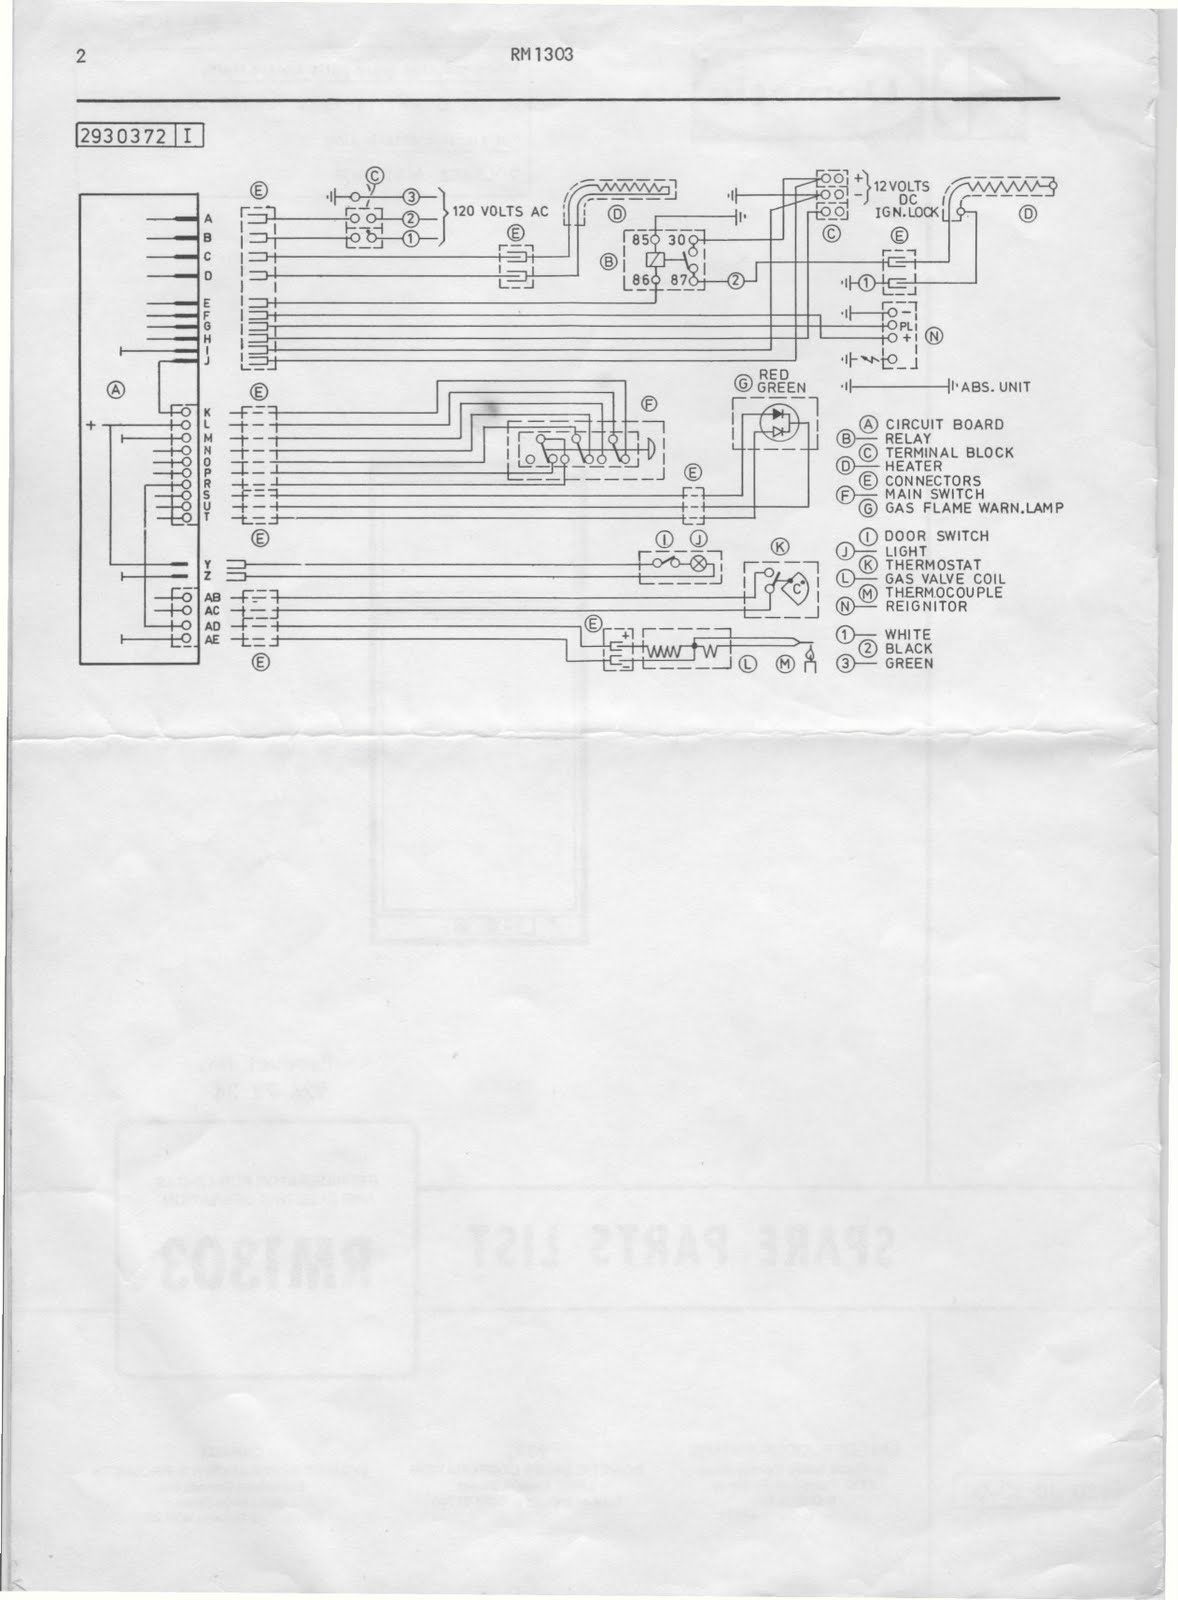 57 chevy heater diagram